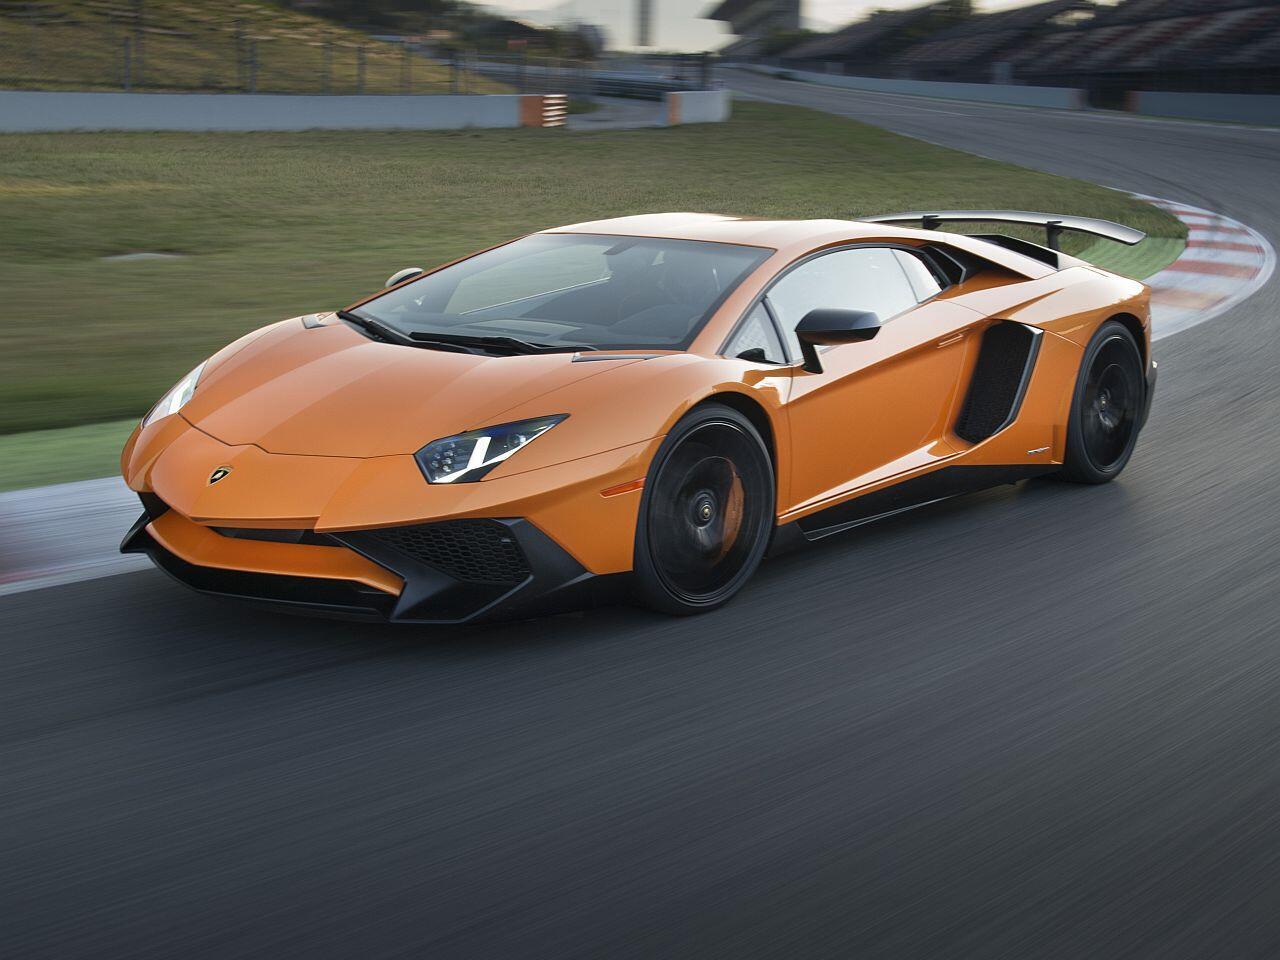 Bild zu Lamborghini Aventador LP 750-4 Superveloce